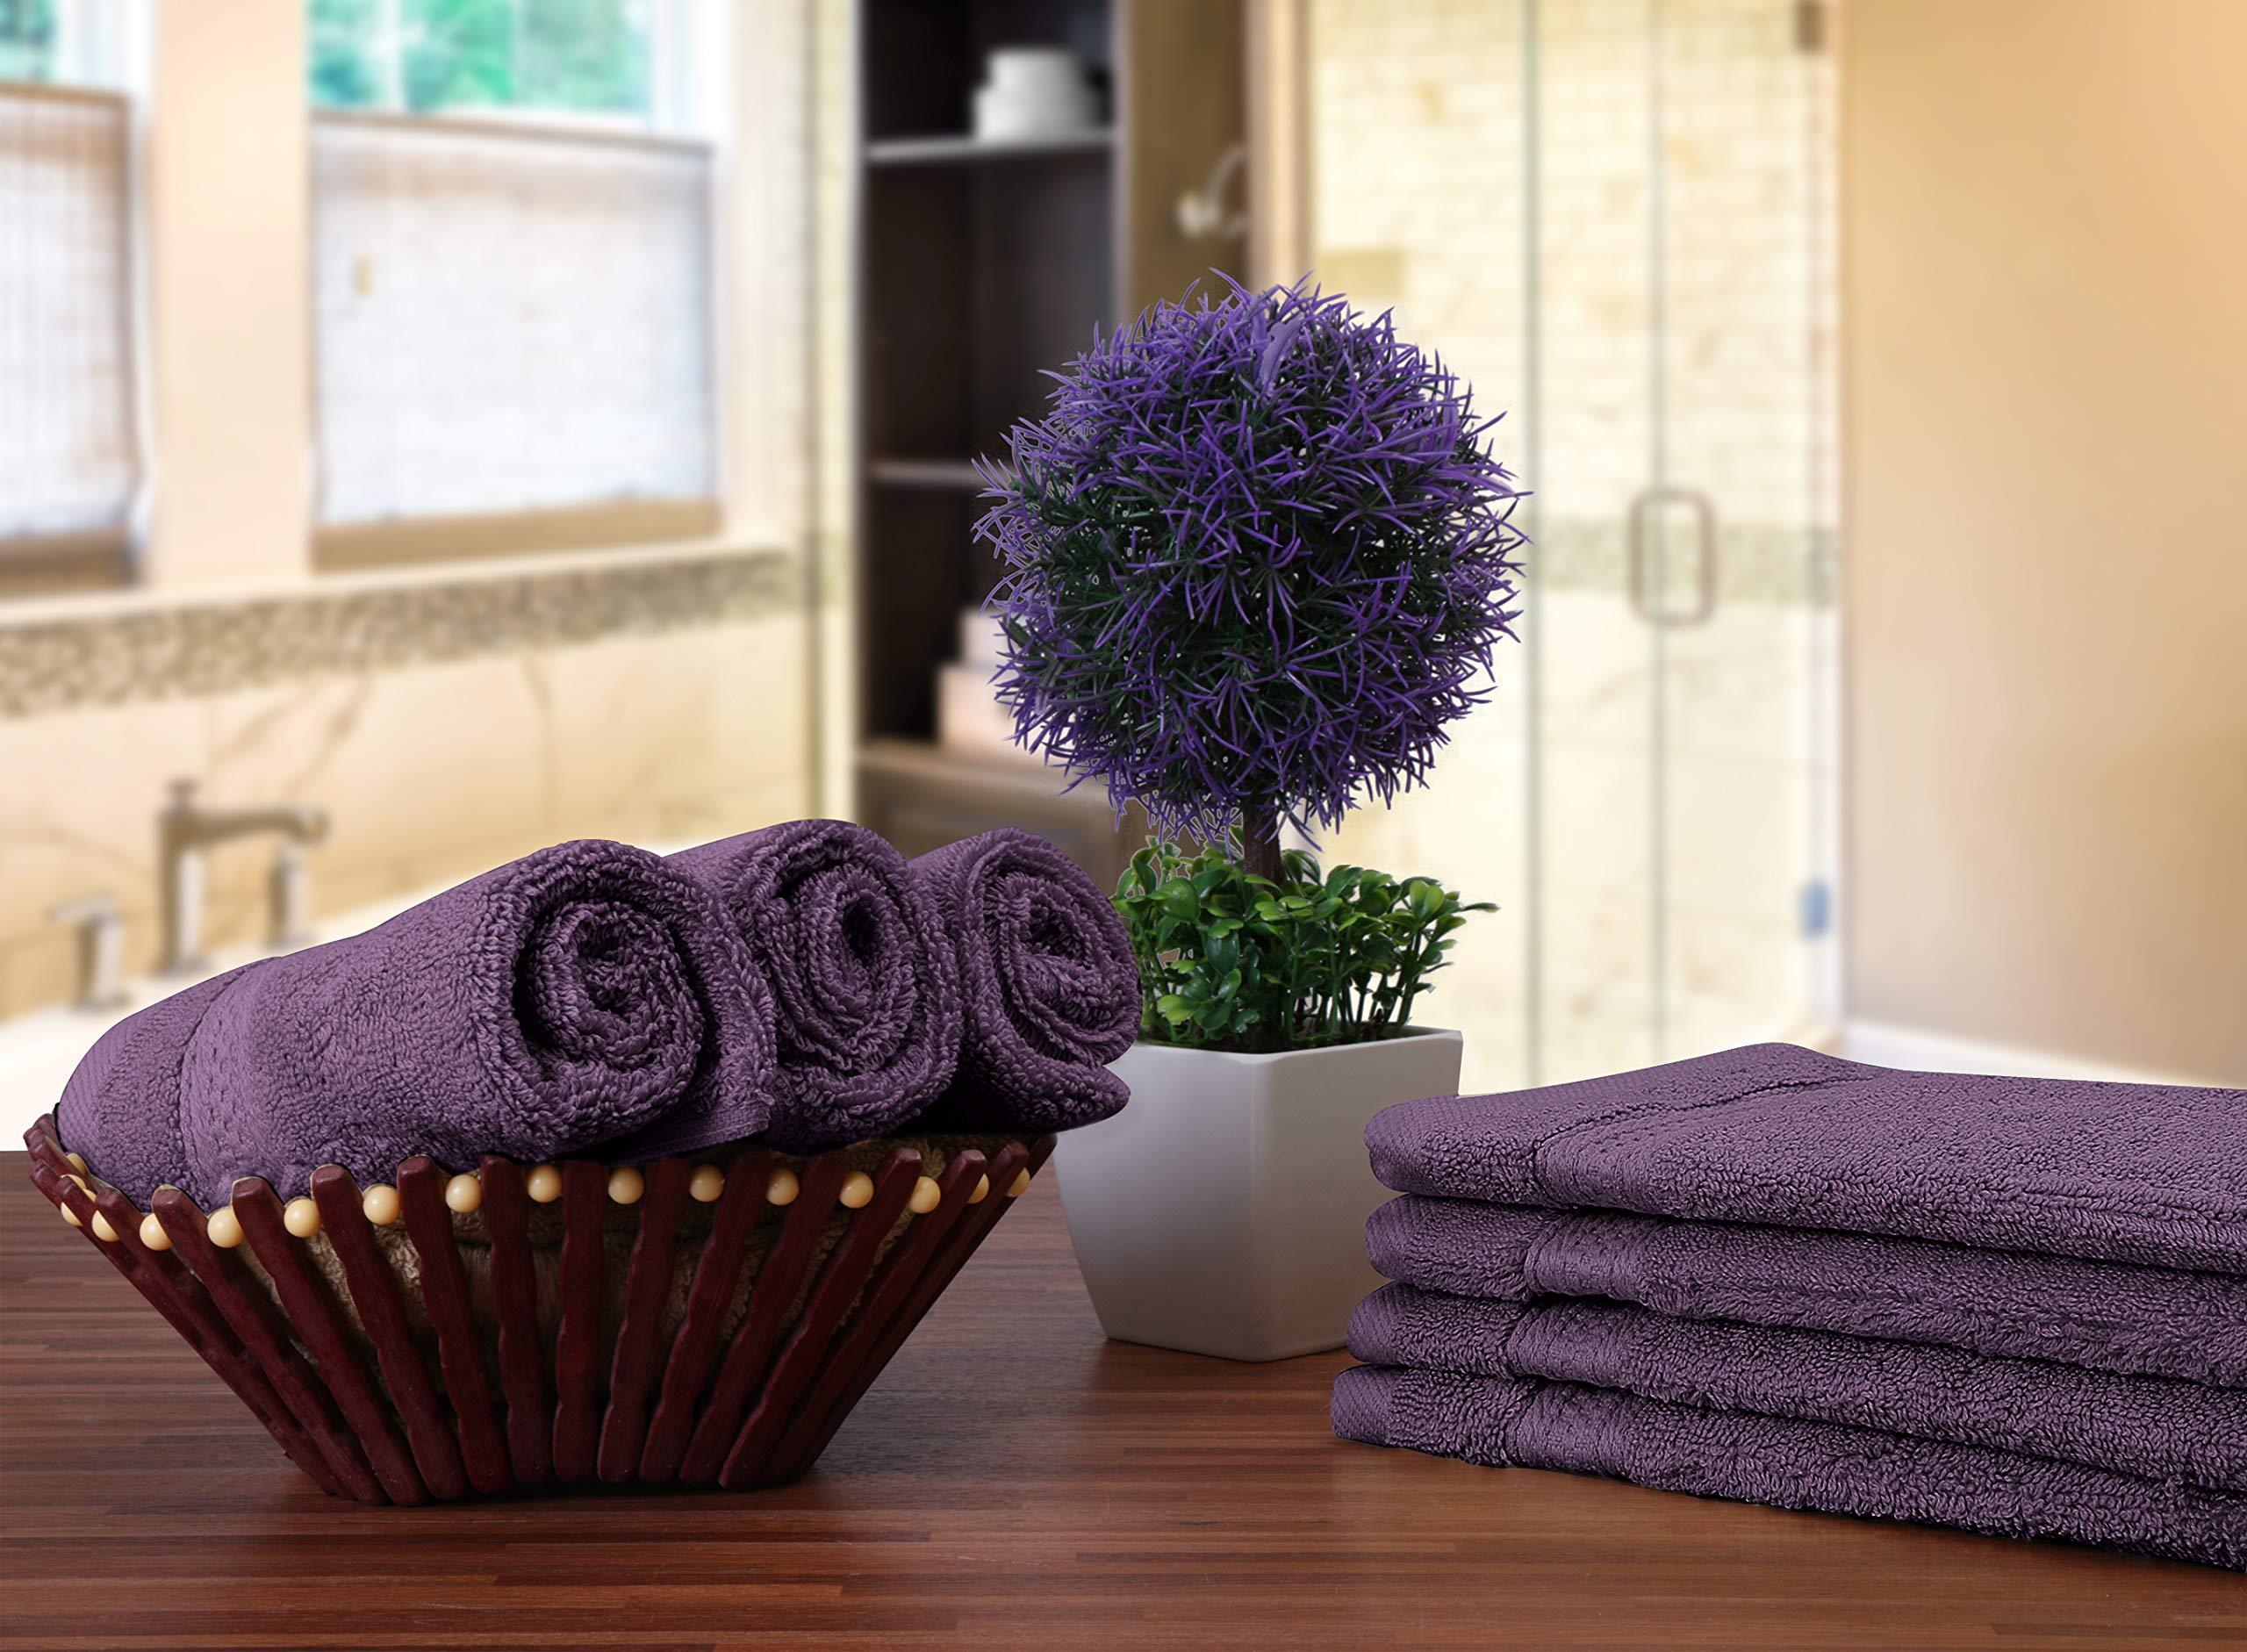 Utopia Towels Premium 252 Pack 700 GSM Cotton Washcloths Bulk– (12 x 12 Inches Face Towels Bulk) Extra Soft Wash Cloths, Plum by Utopia Towels (Image #4)